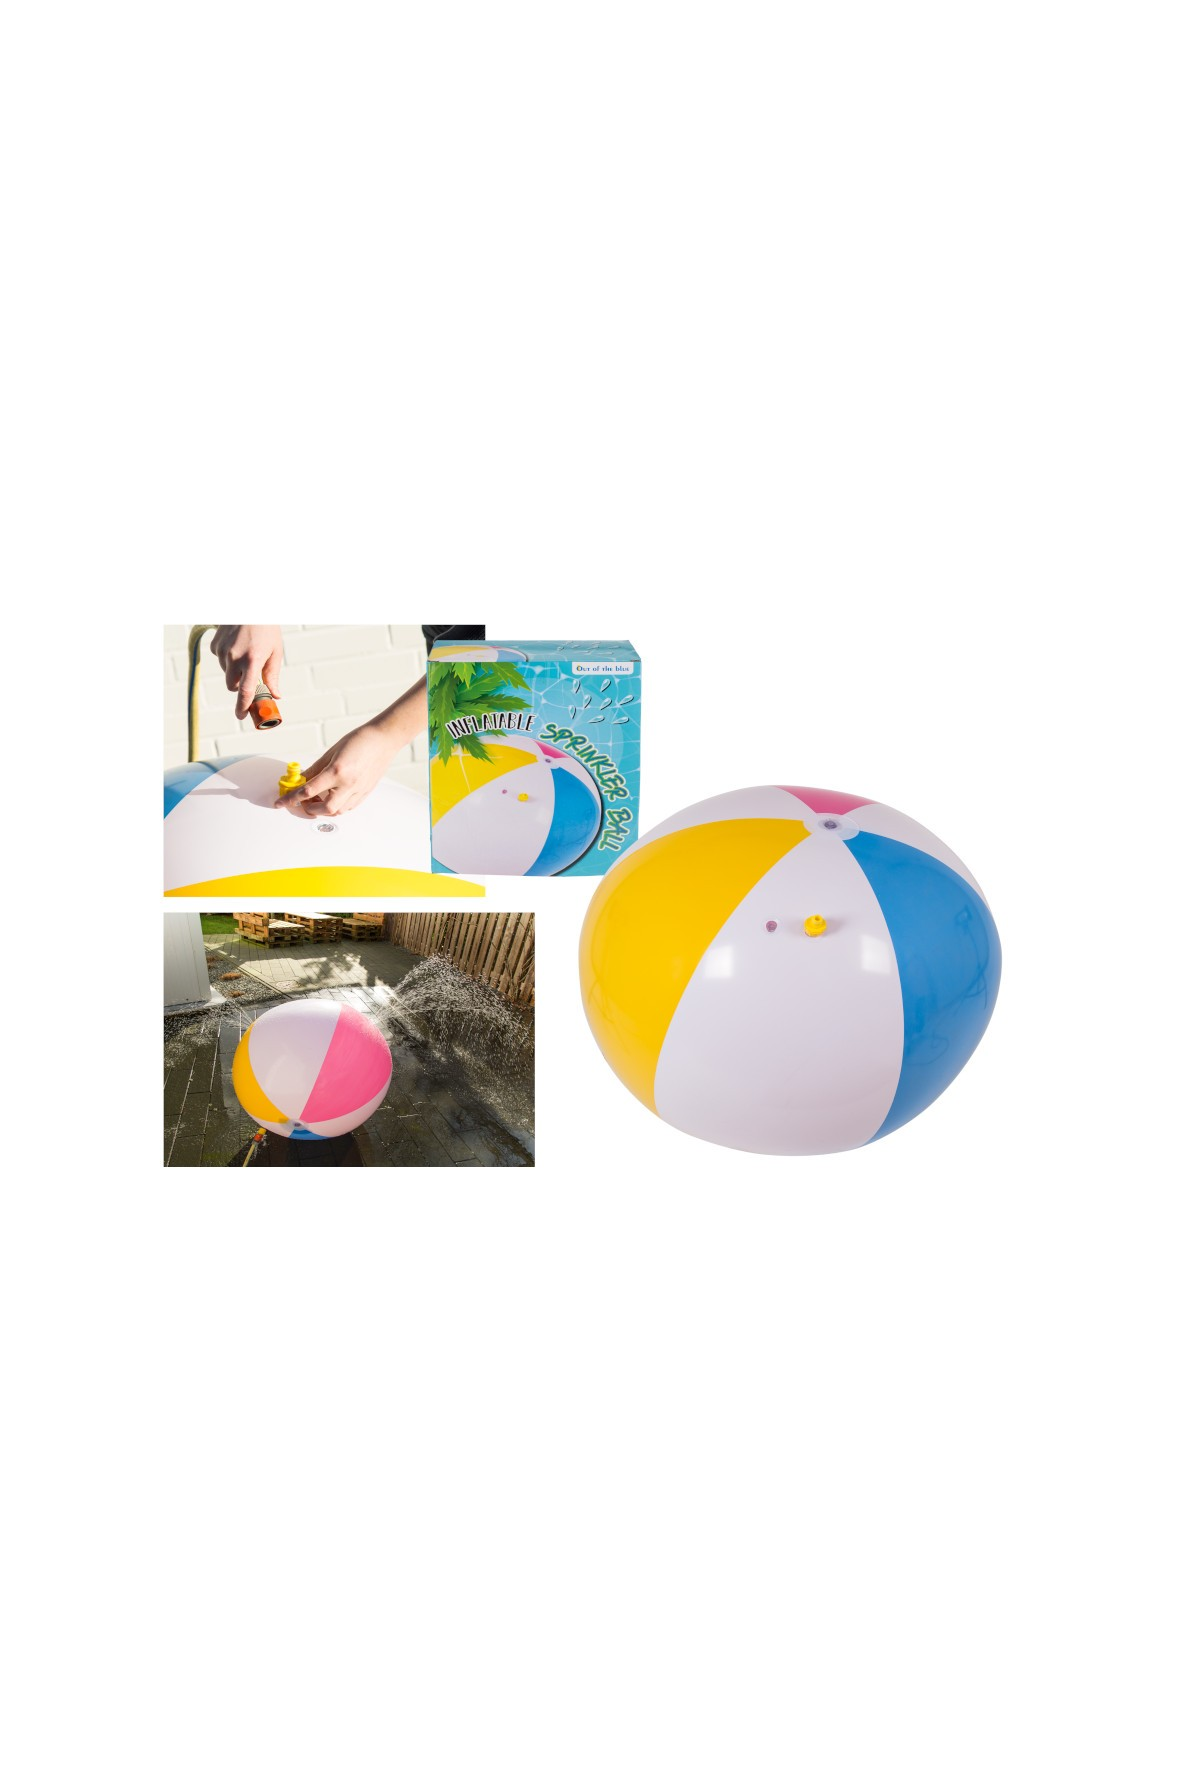 Piłka plażowa - 20x9x25 cm